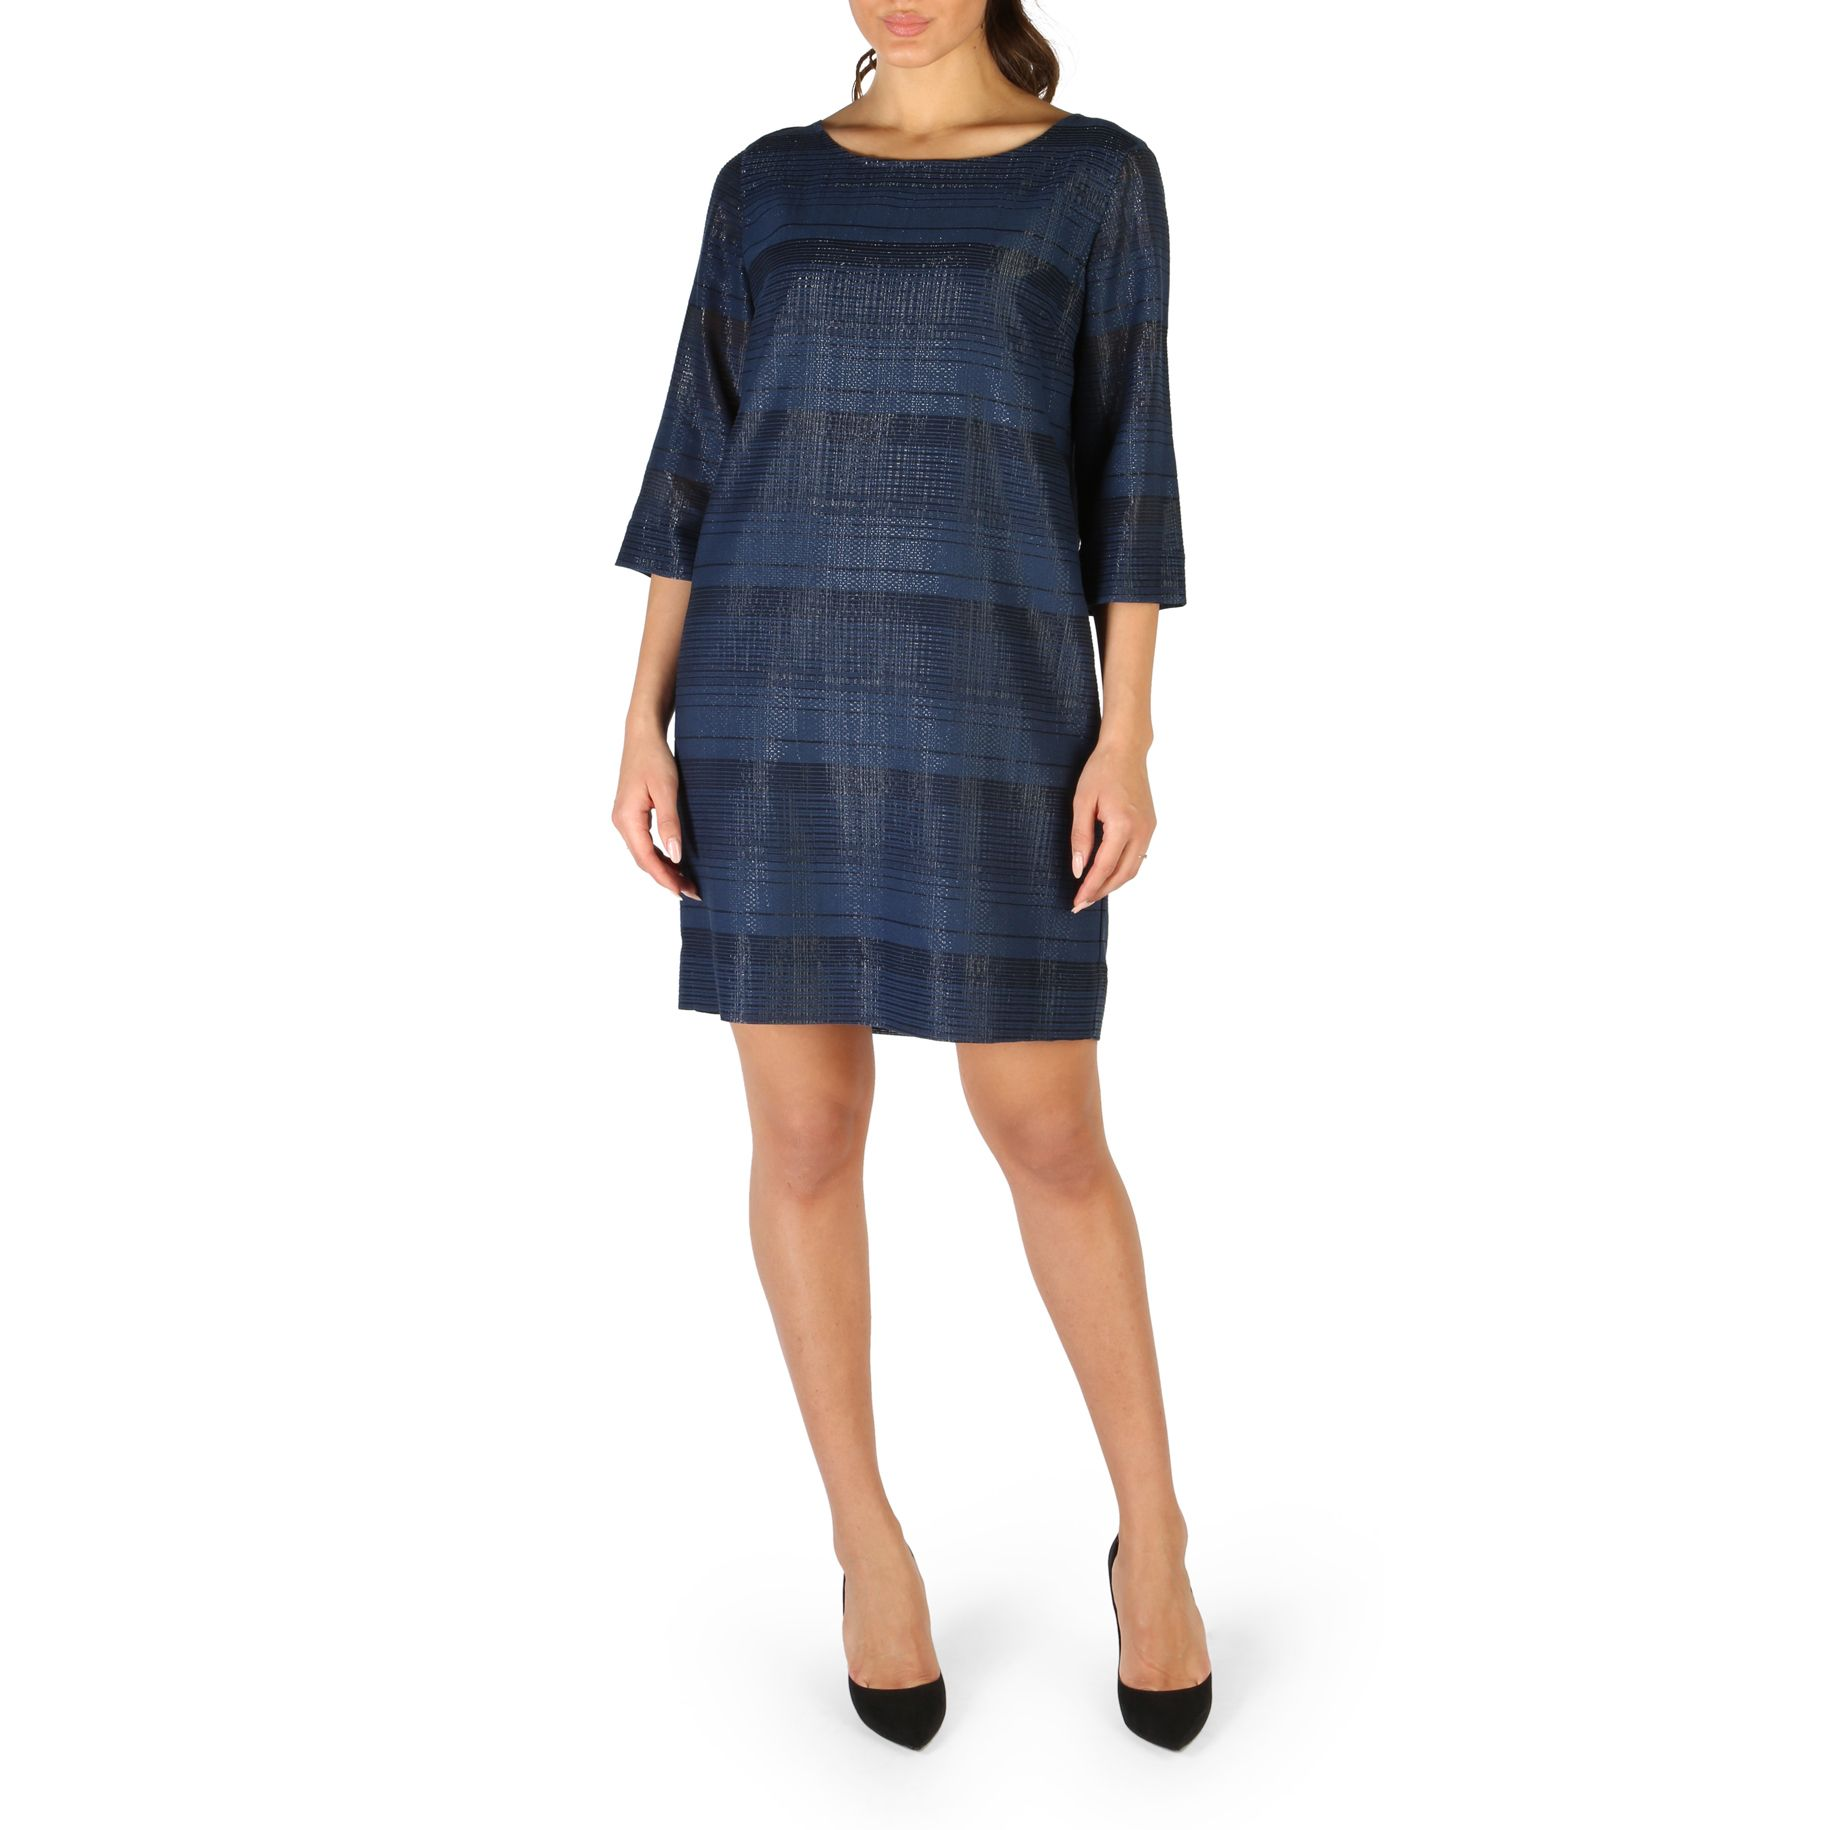 Fontana 2.0 Womens Dresses